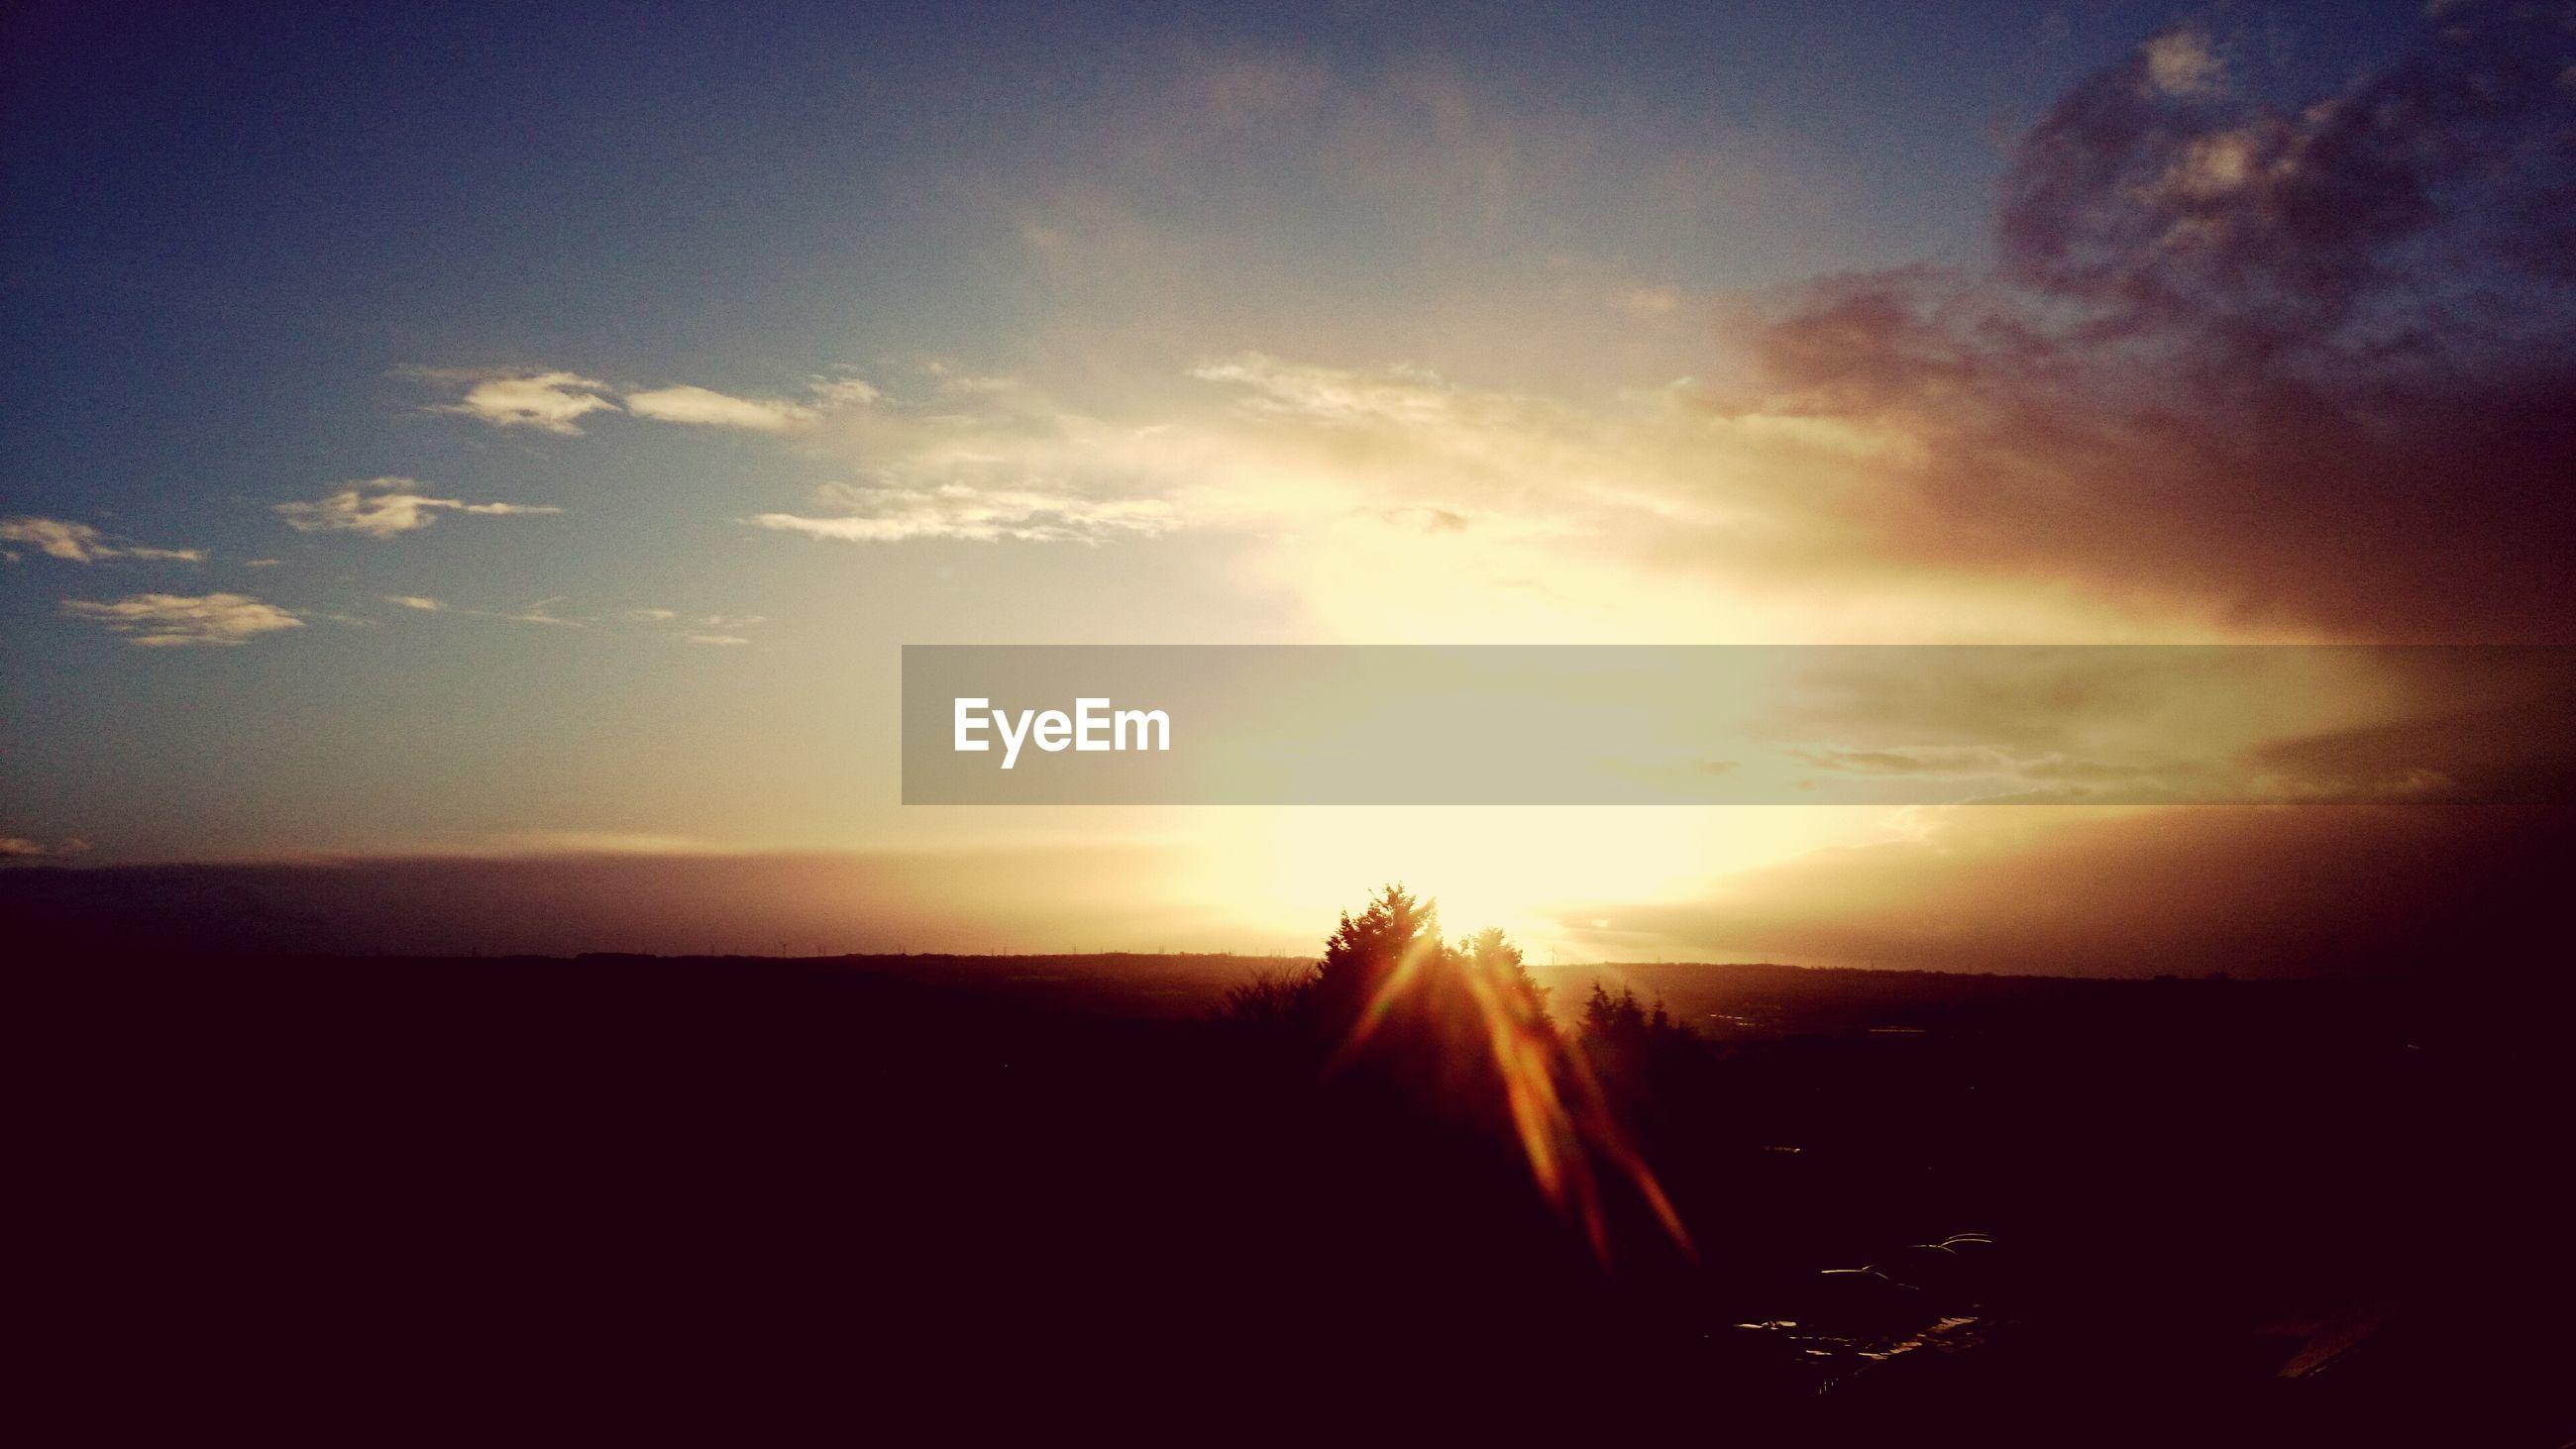 sun, sunset, sky, sunbeam, scenics, tranquil scene, silhouette, beauty in nature, sunlight, tranquility, cloud - sky, nature, lens flare, idyllic, landscape, cloud, orange color, back lit, outdoors, no people